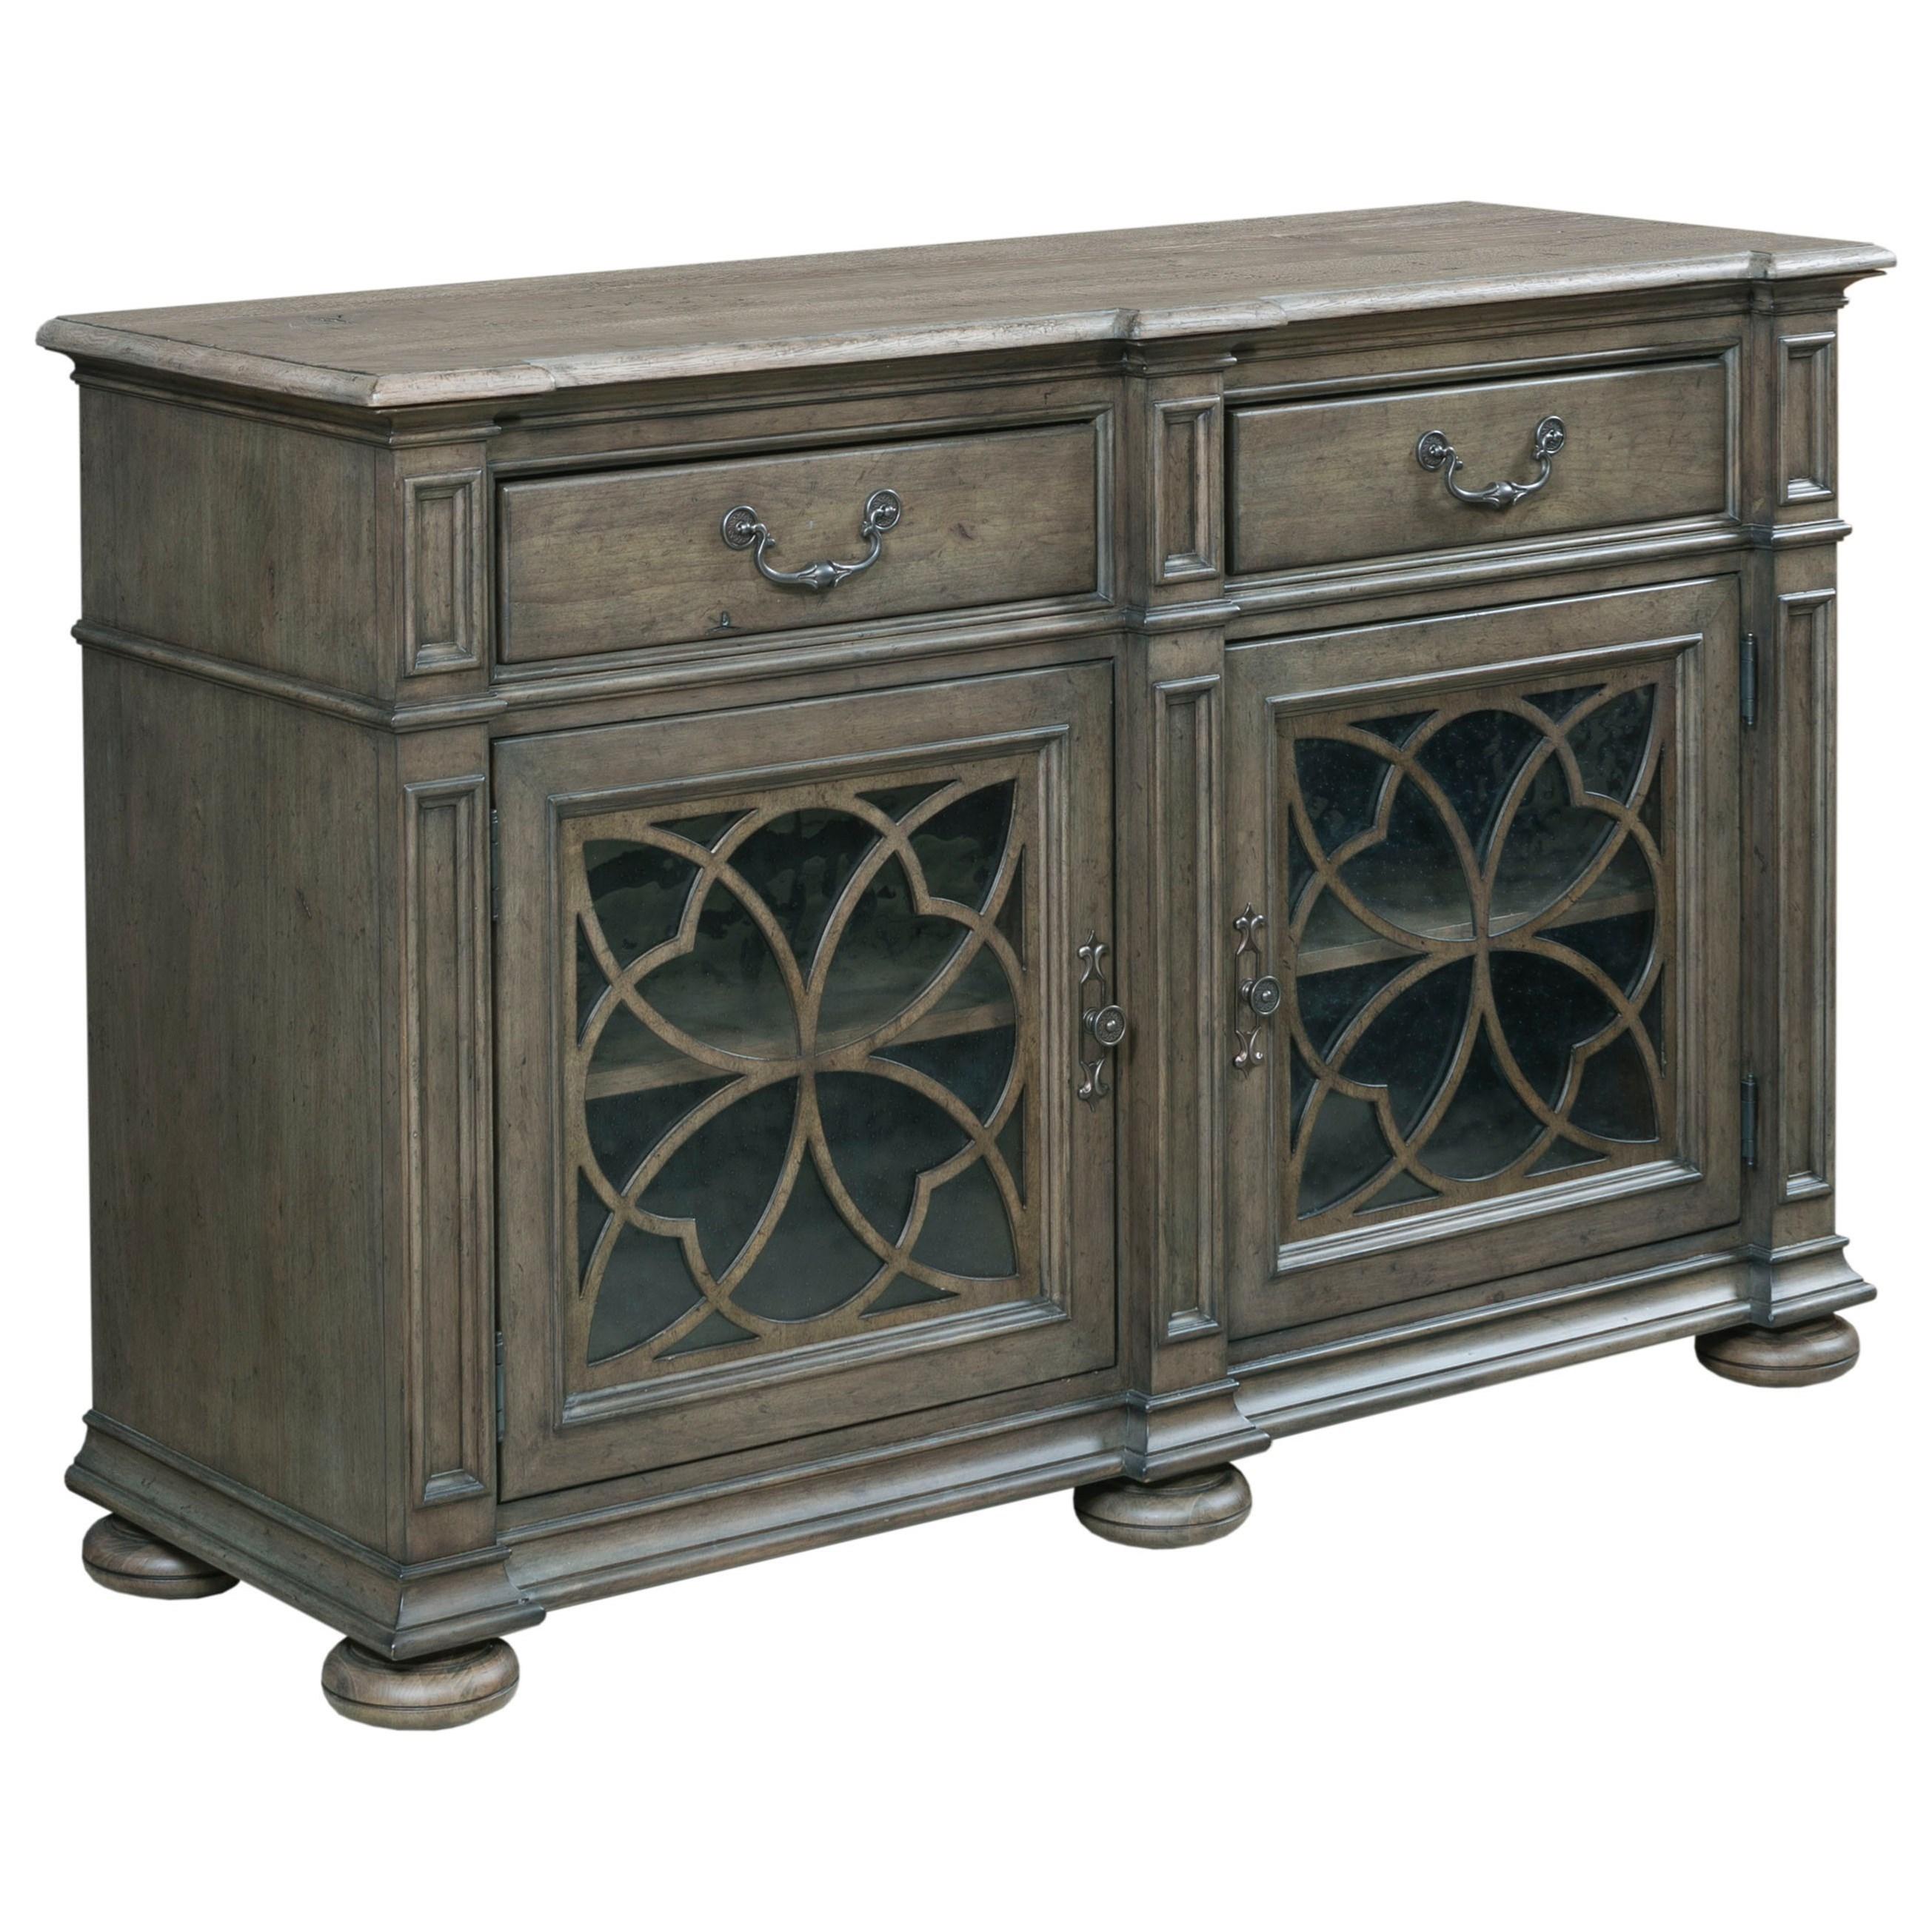 Kincaid Furniture Greyson 608 830 Harper Two Door Buffet